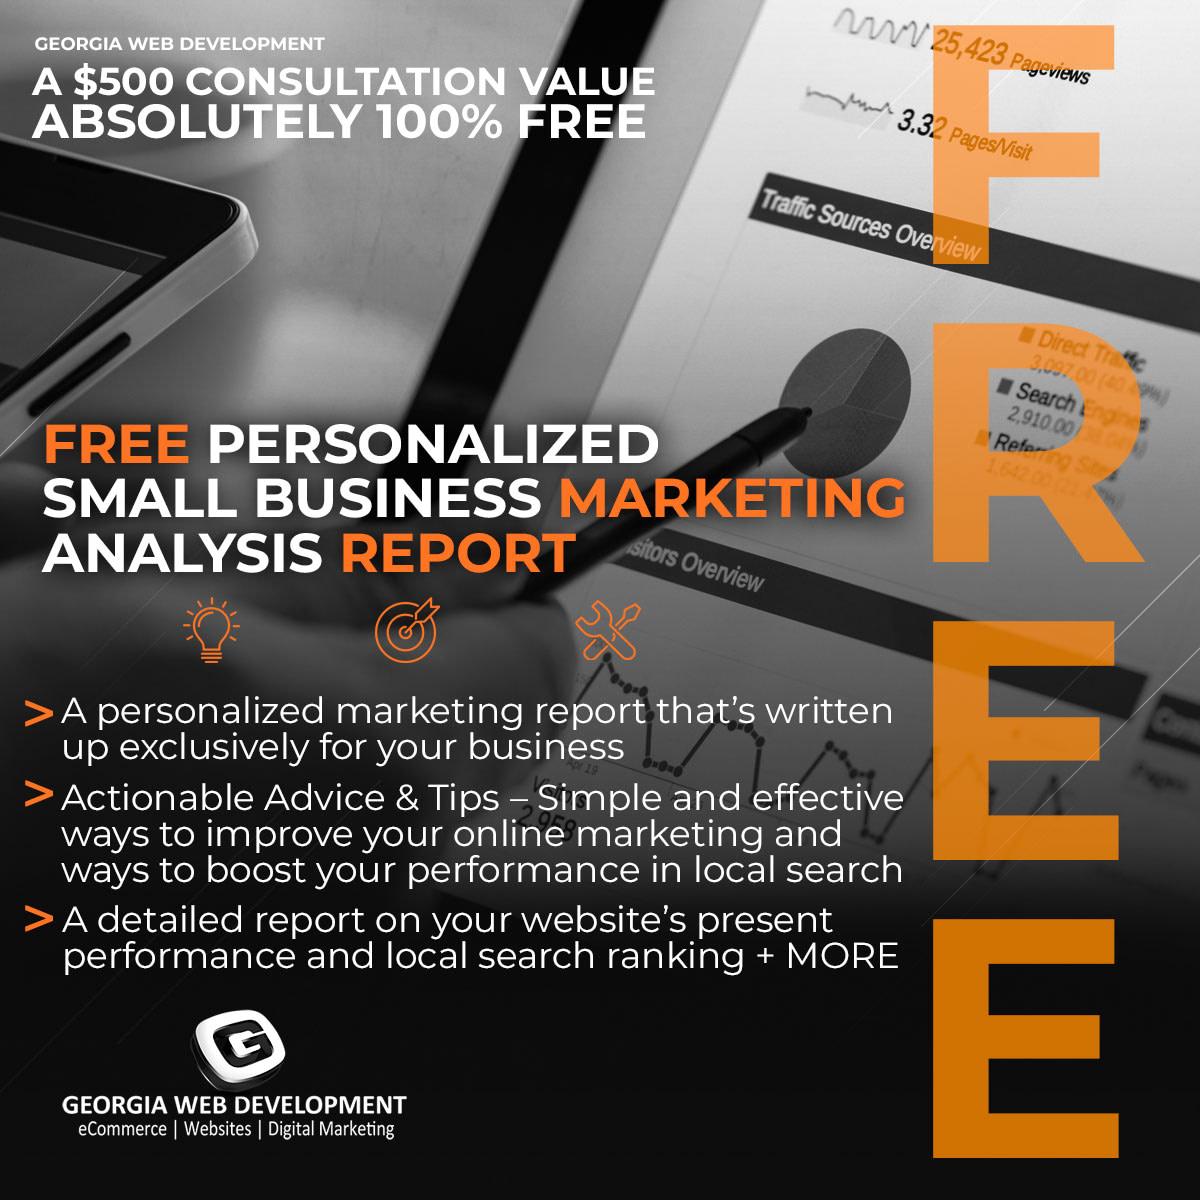 image of FREE-Expert-Small-Business-Marketing-Analysis-&-Tips-Offer-Georgia-Web-Development